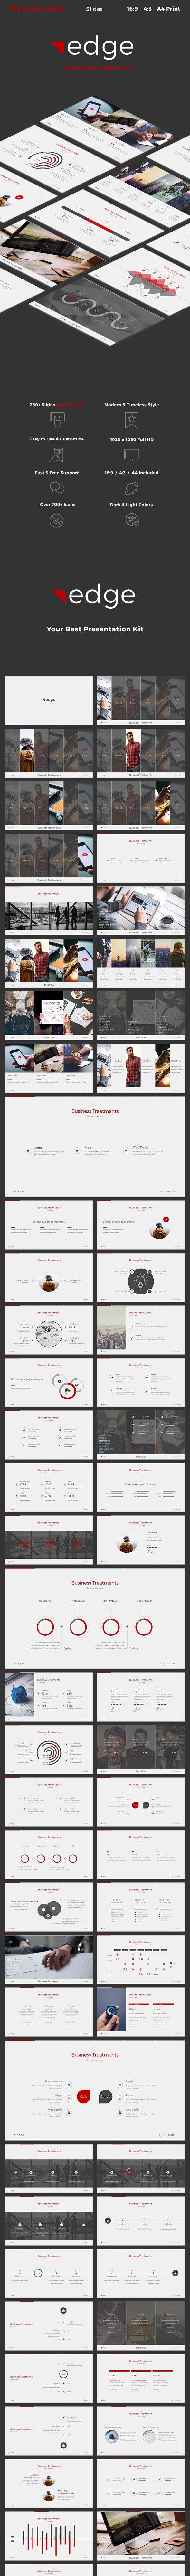 Edge Google Slides - Google Slides Presentation Templates